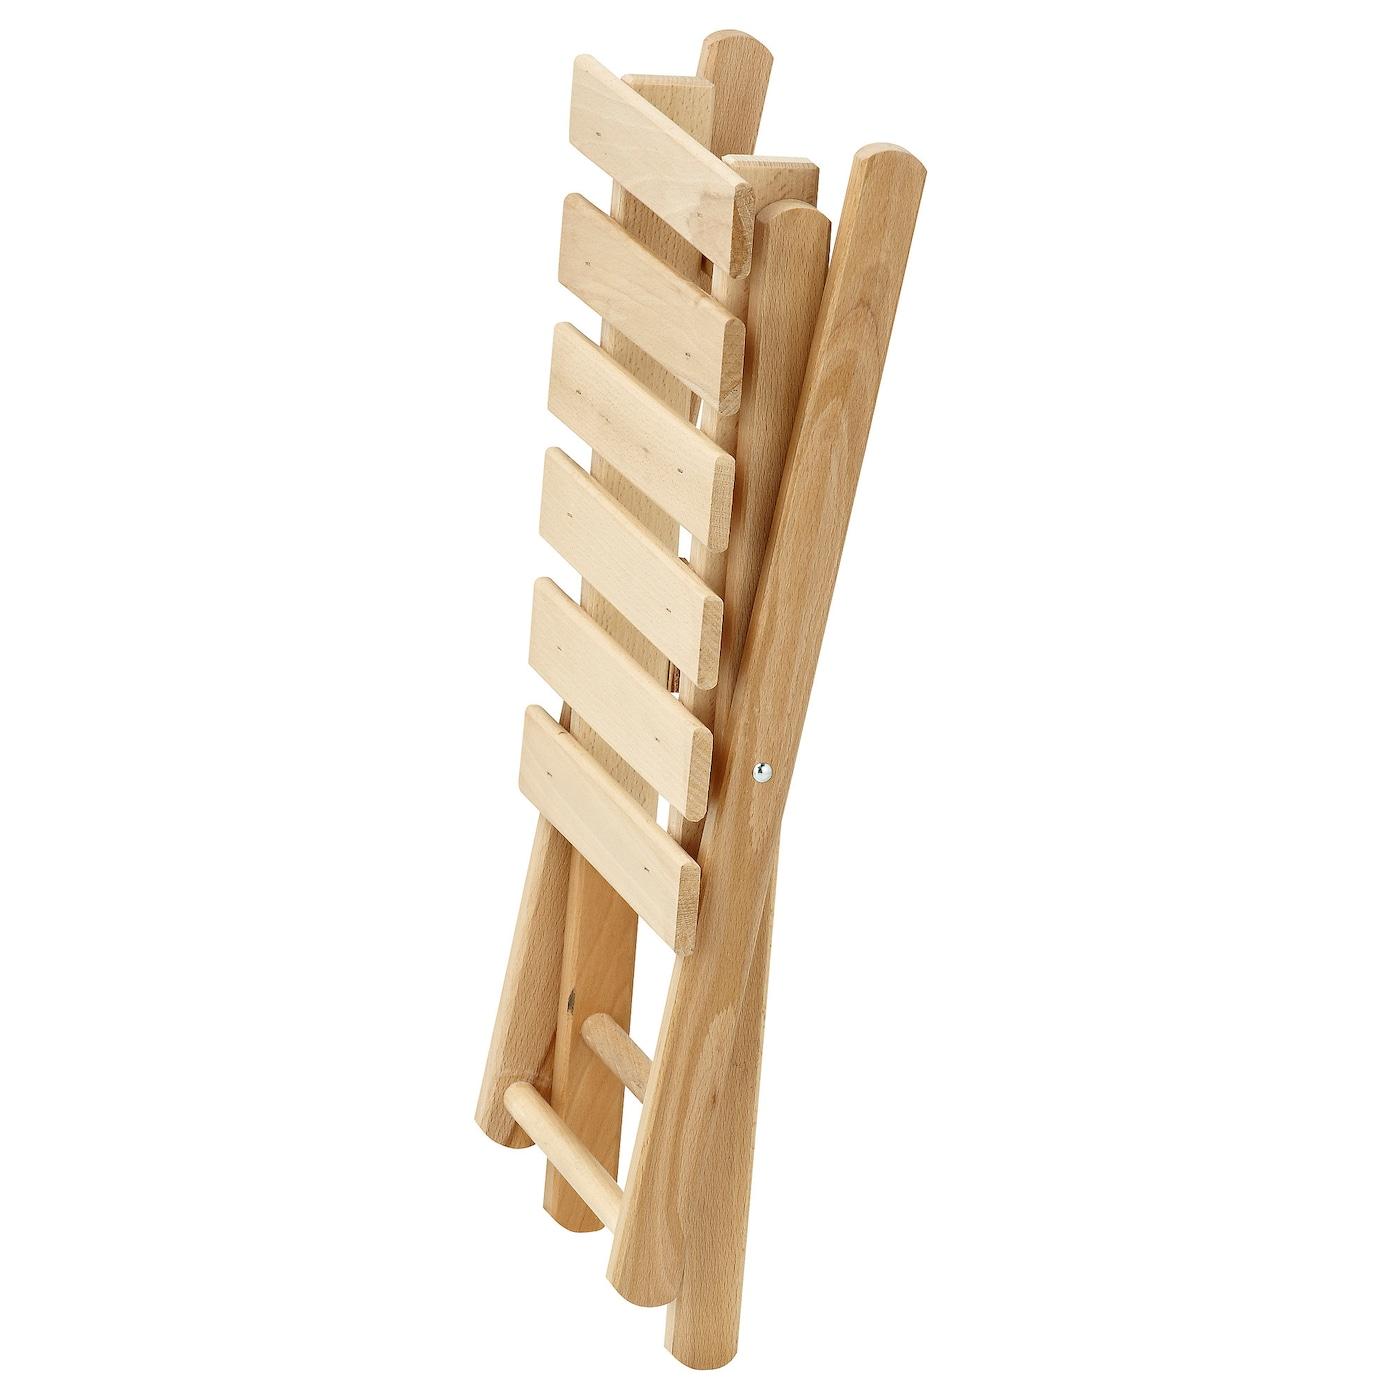 Bedroom Benches Ikea Step Stool Folding: HALLFRED Stool, Foldable Beech